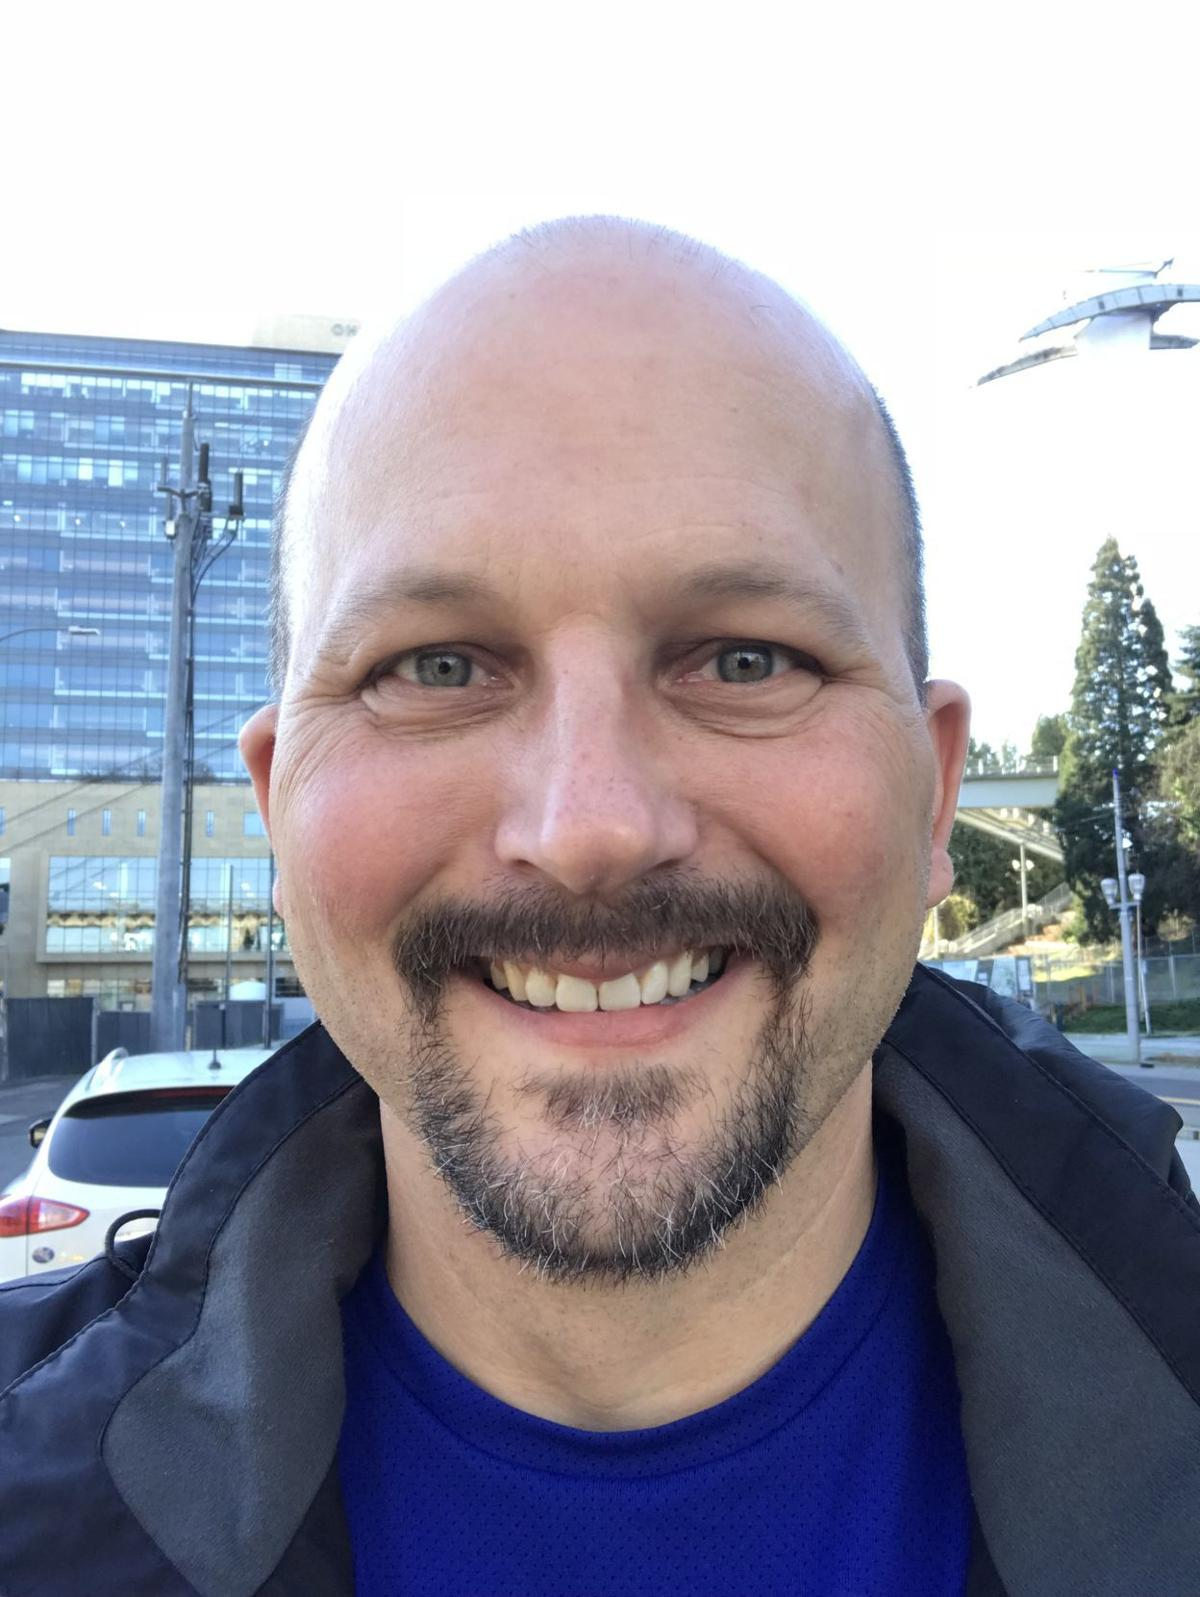 Jon Zwemke